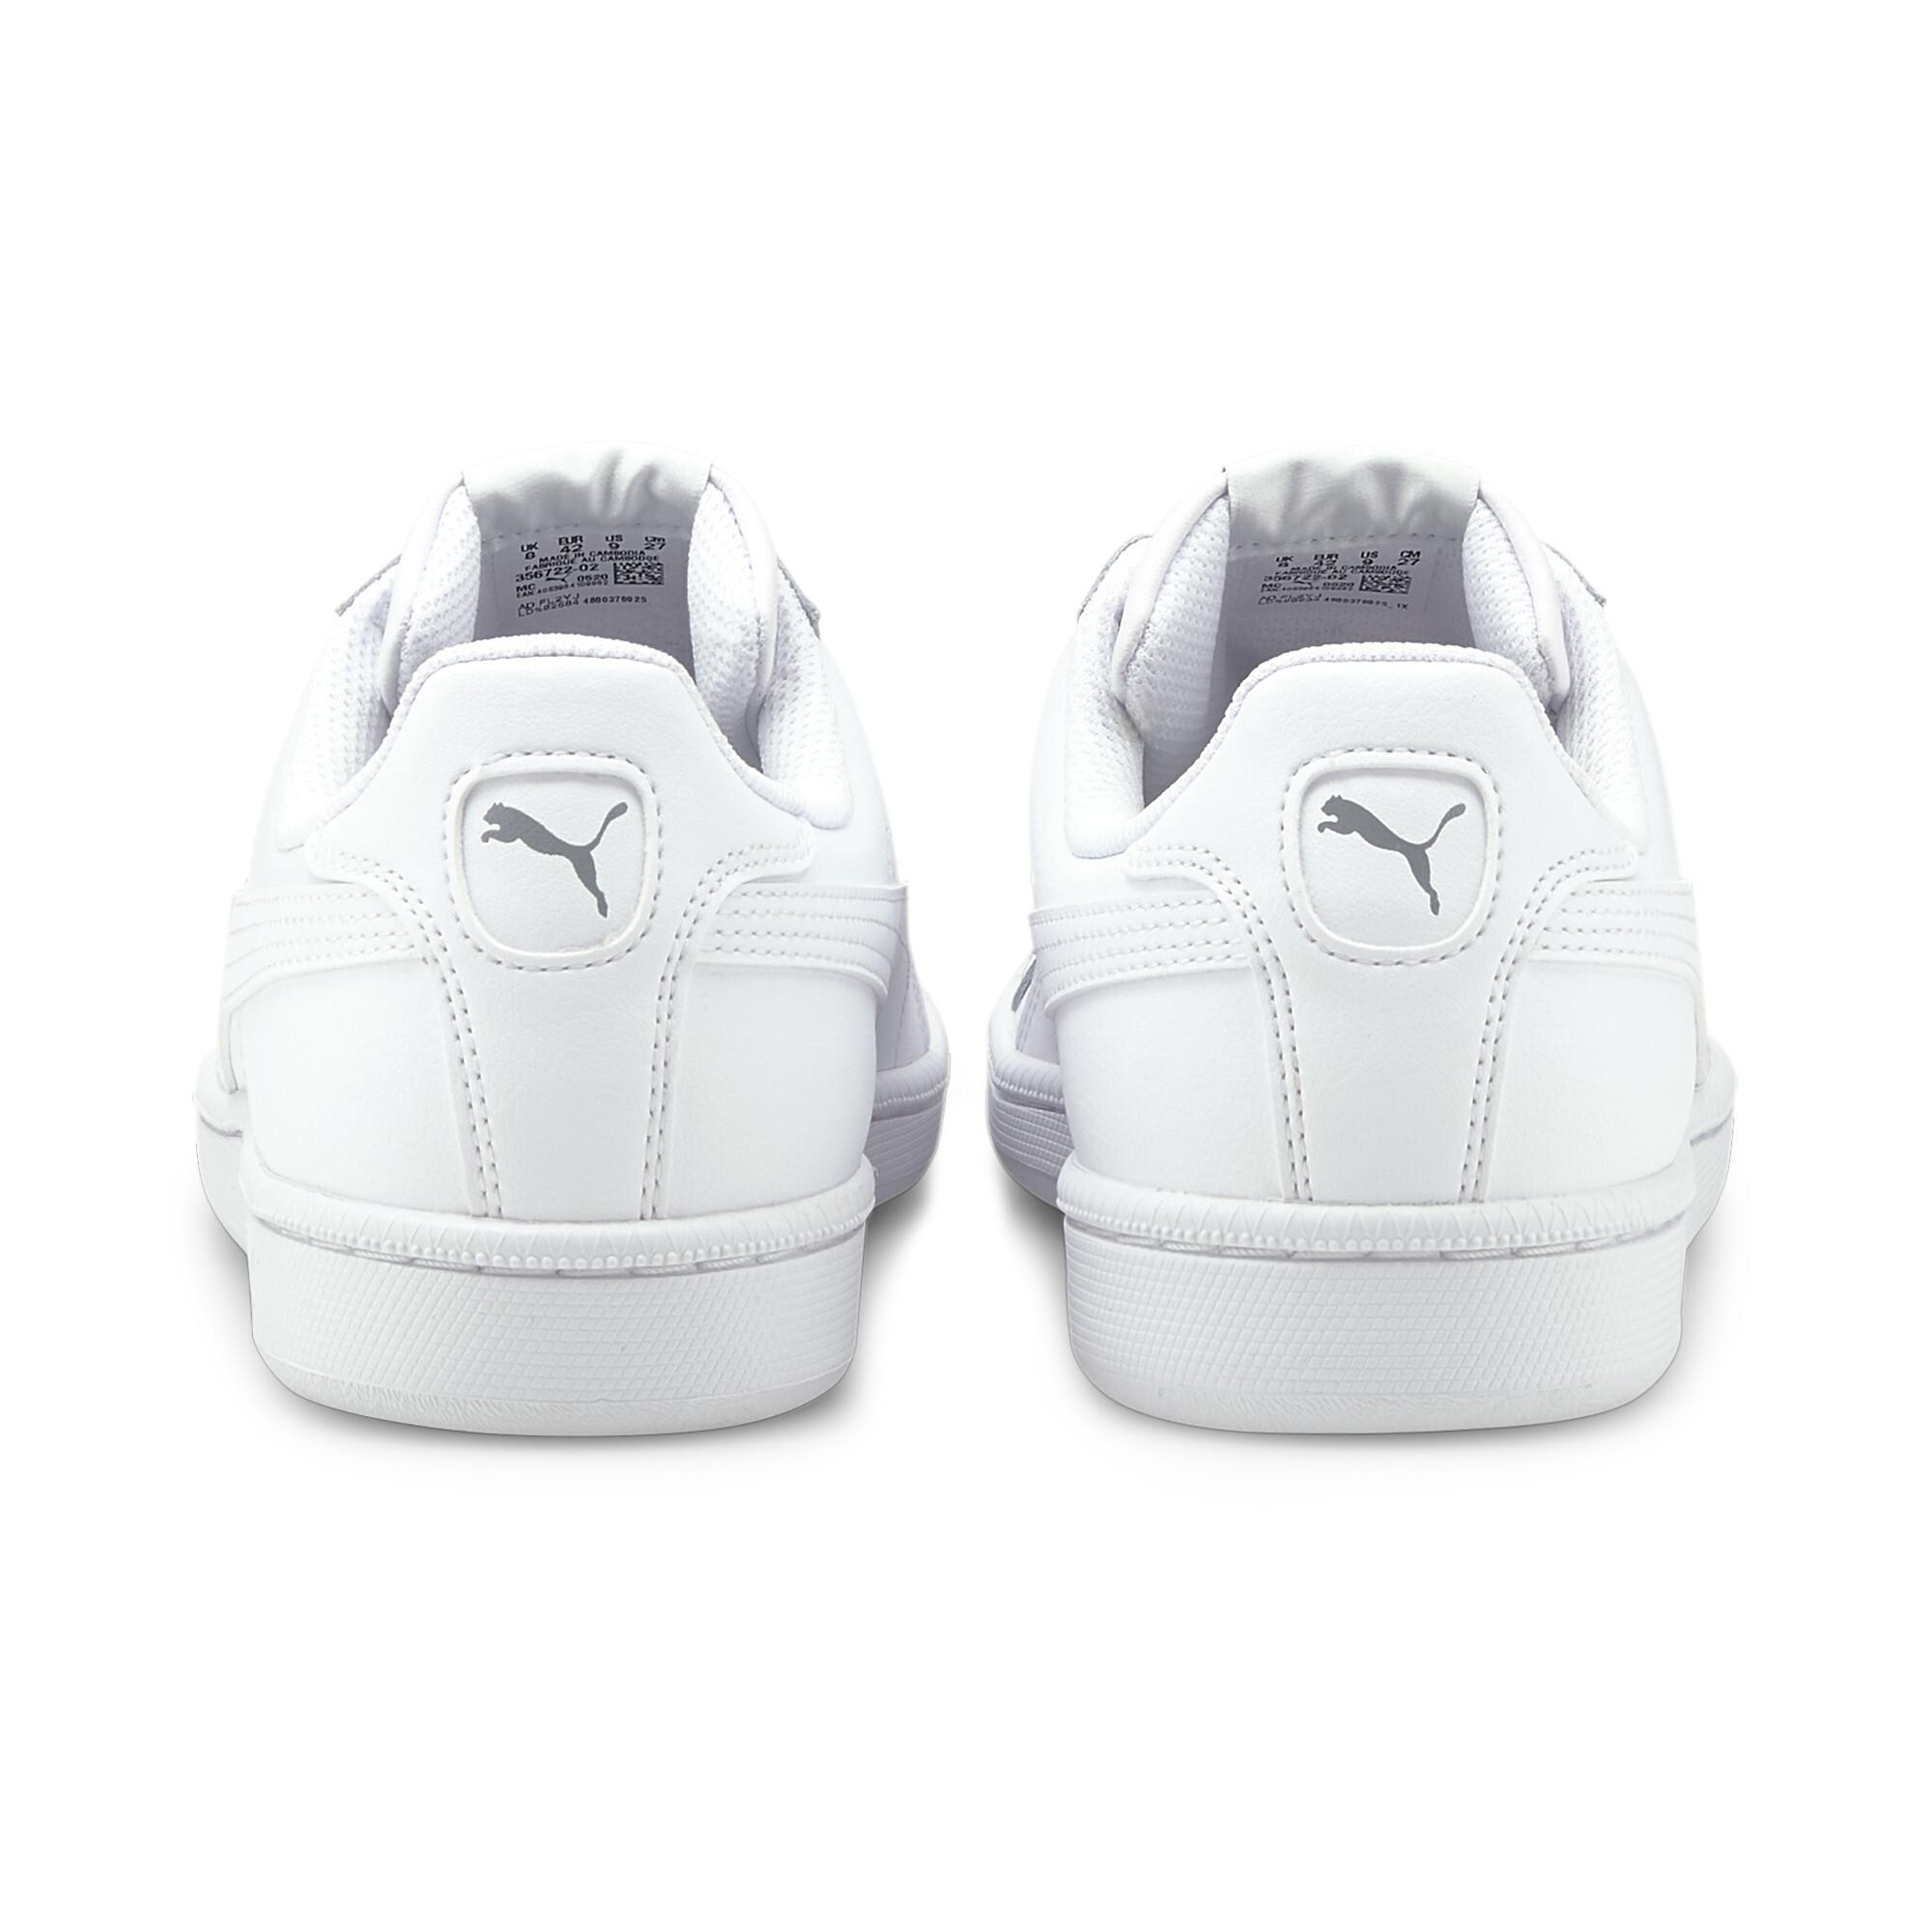 PUMA-Smash-Trainers-Schuhe-Sneakers-Sport-Classics-Unisex-Neu Indexbild 13